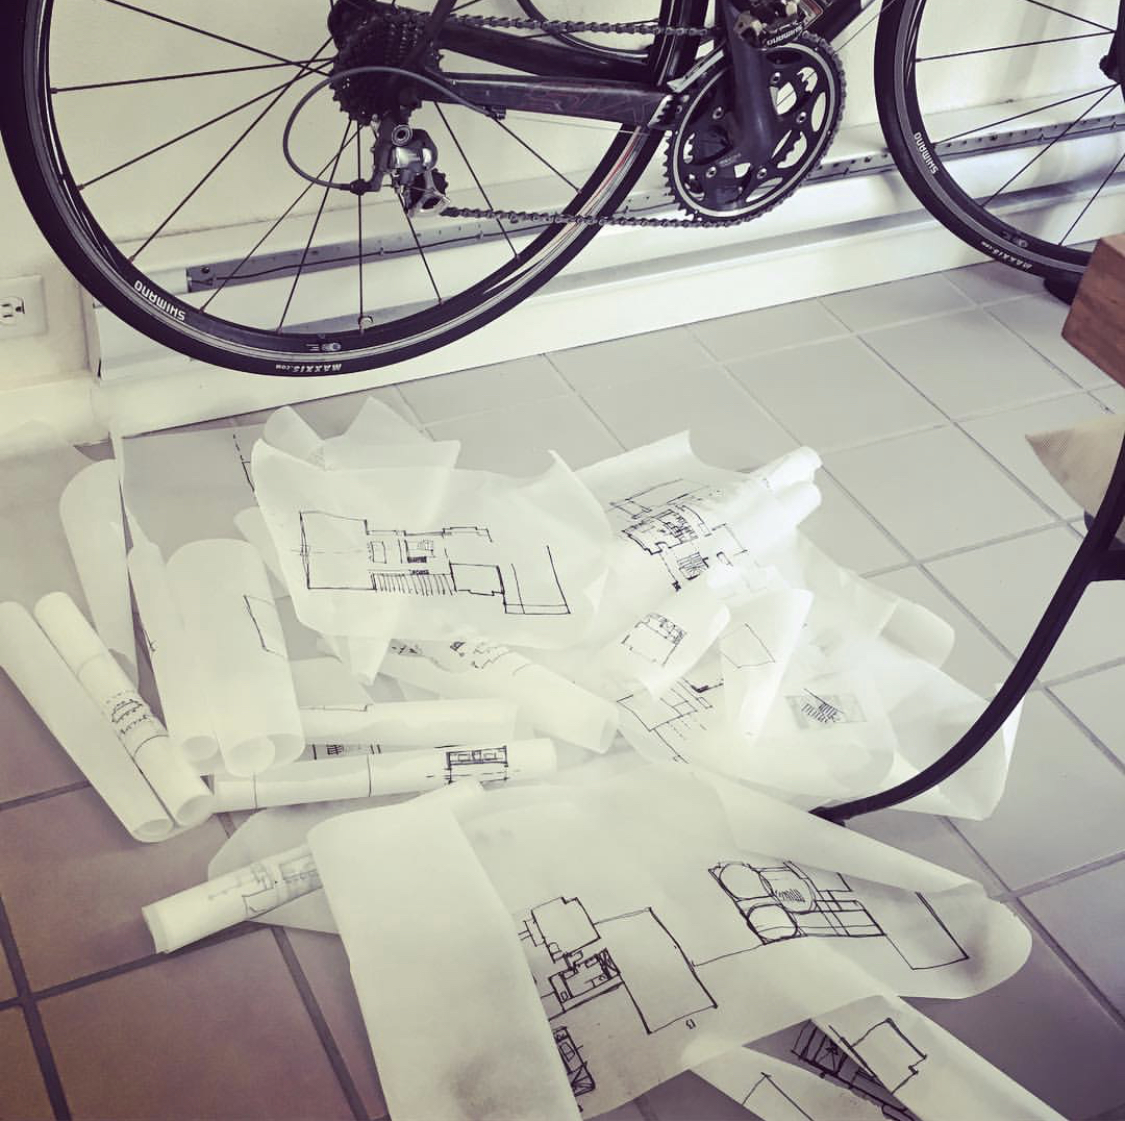 The floor of the design studio often looks like this.